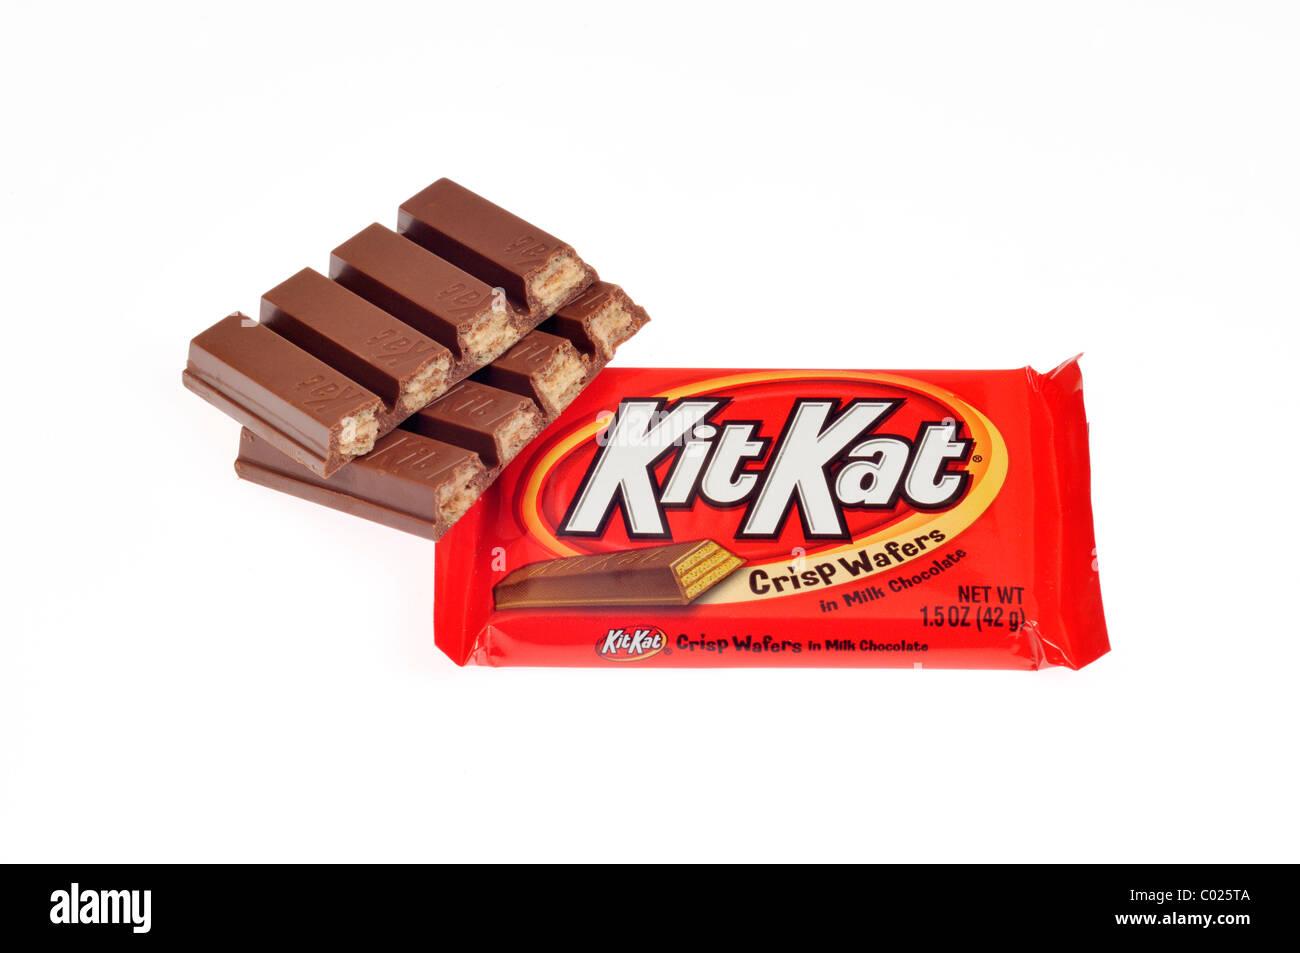 Candy Wrapper Imágenes De Stock & Candy Wrapper Fotos De Stock - Alamy